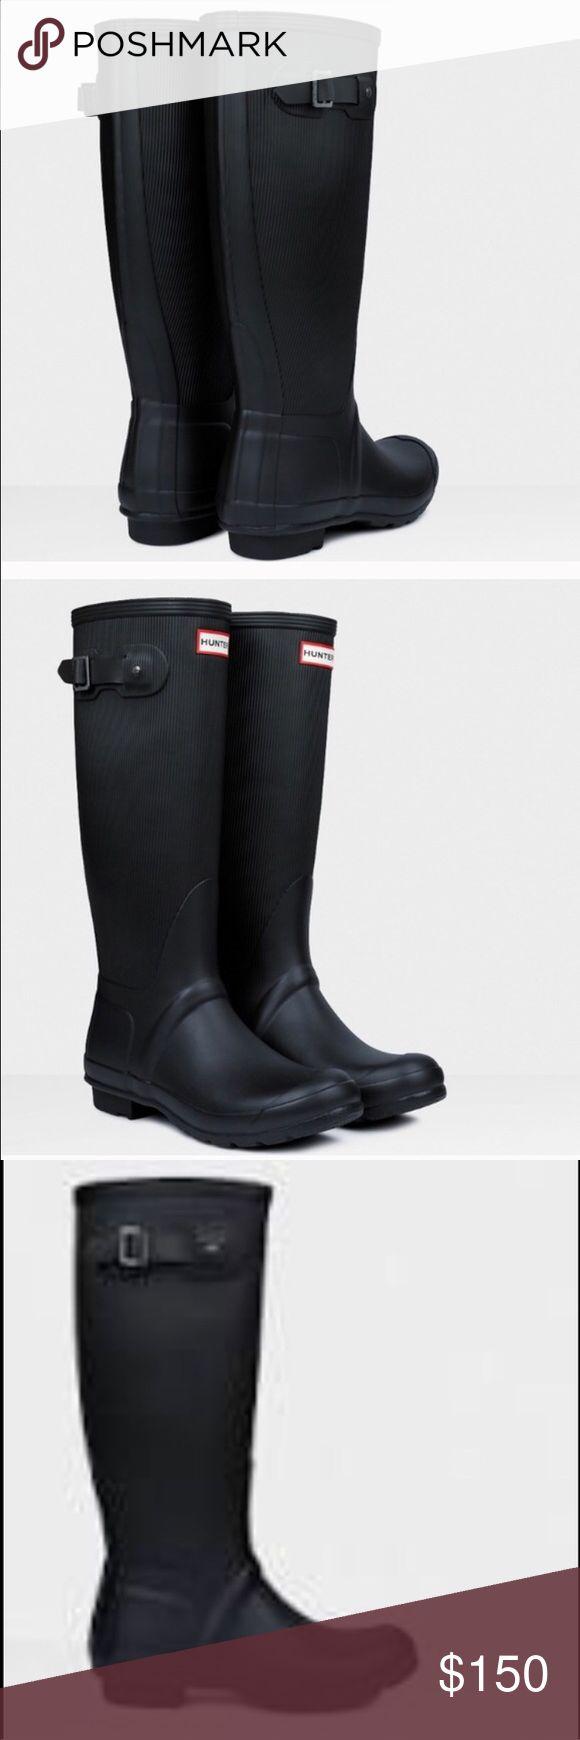 Brand new hunter black rain boots New in box US size 8 Hunter Boots Shoes Winter & Rain Boots